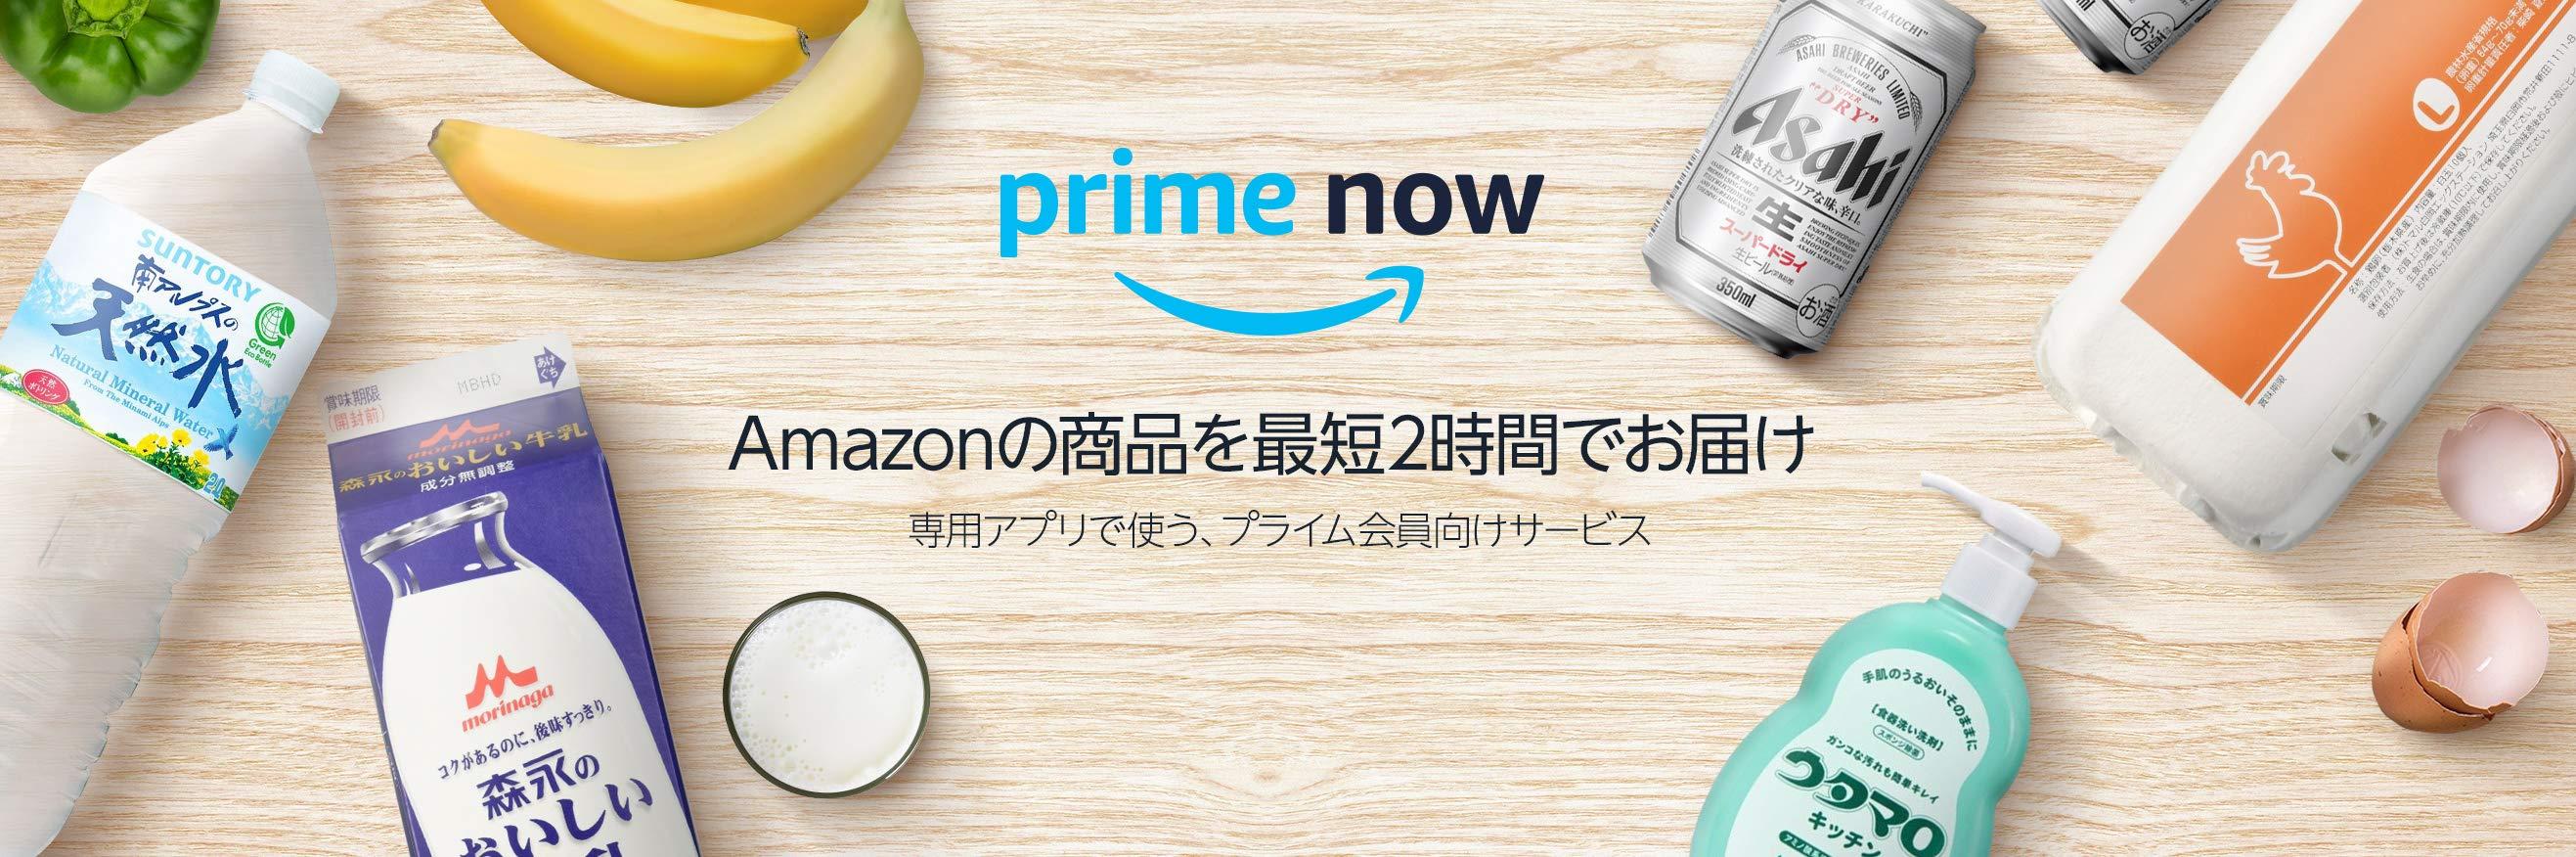 Amazon Prime Now(アマゾンプライム ナウ) -好きな時間が選べる、最短2時間で届く